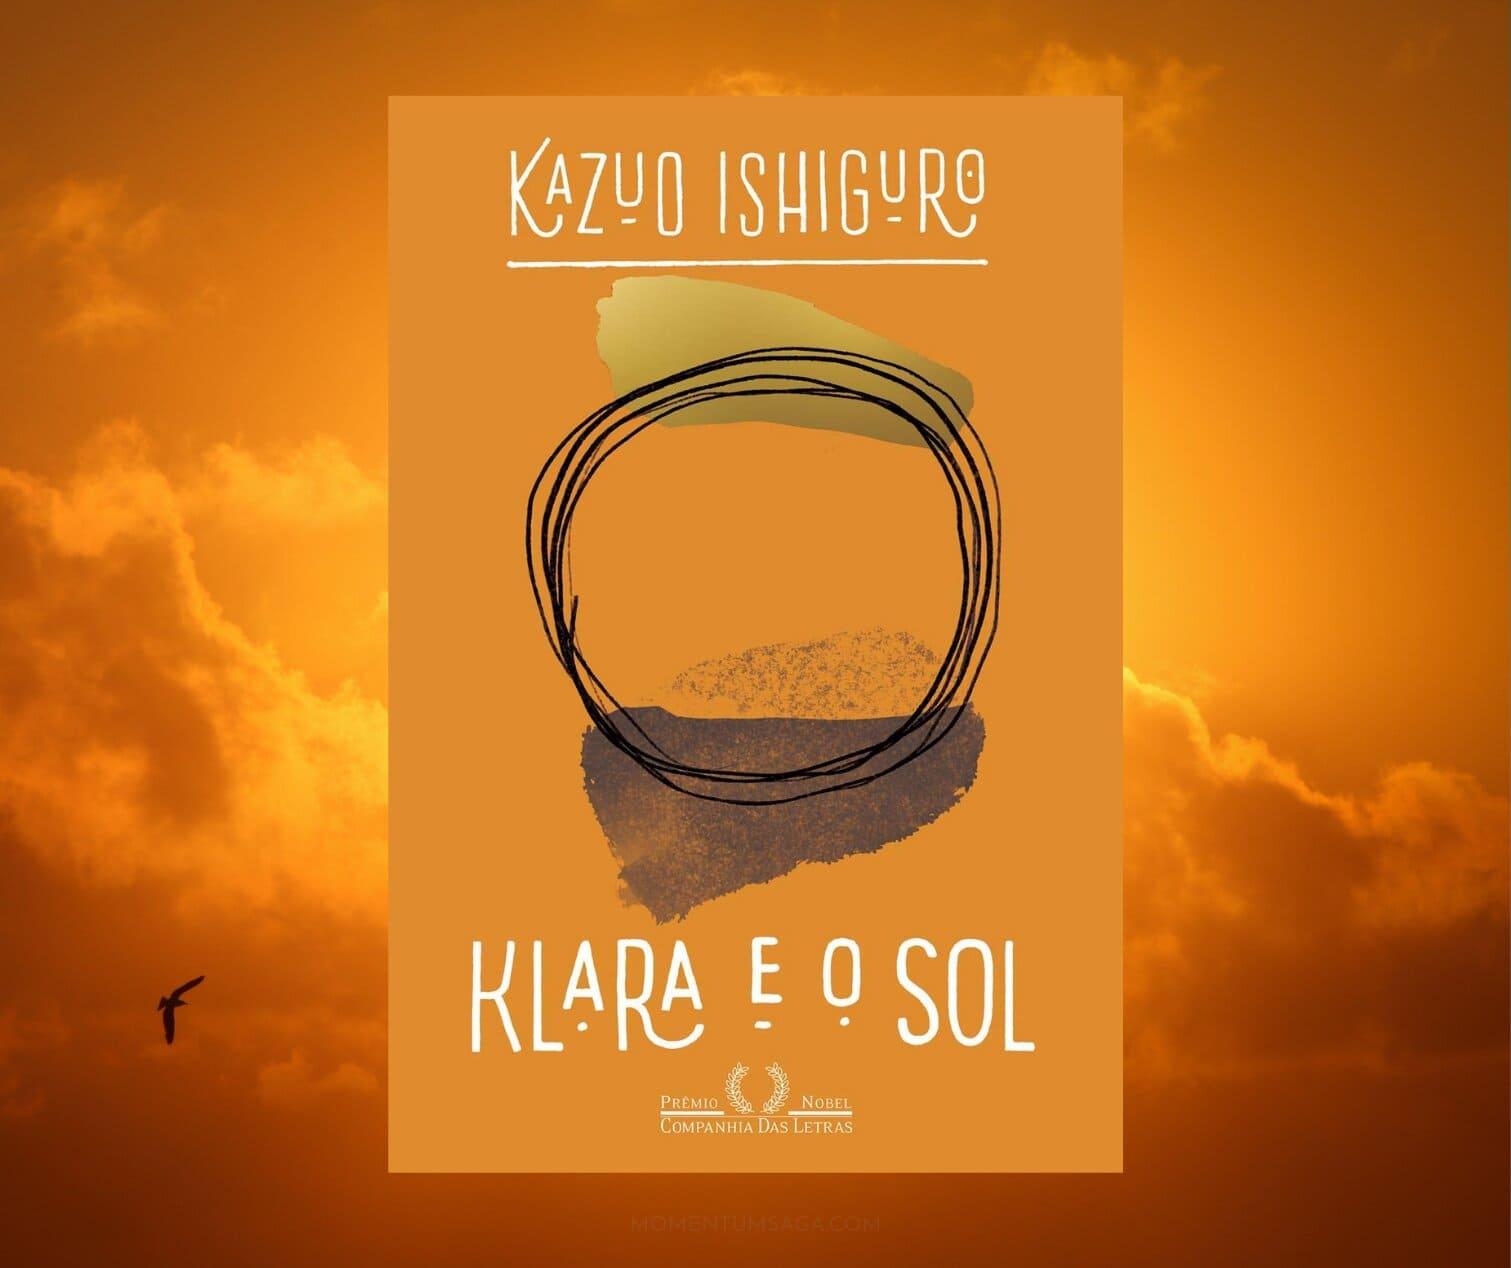 Resenha: Klara e o Sol, de Kazuo Ishiguro